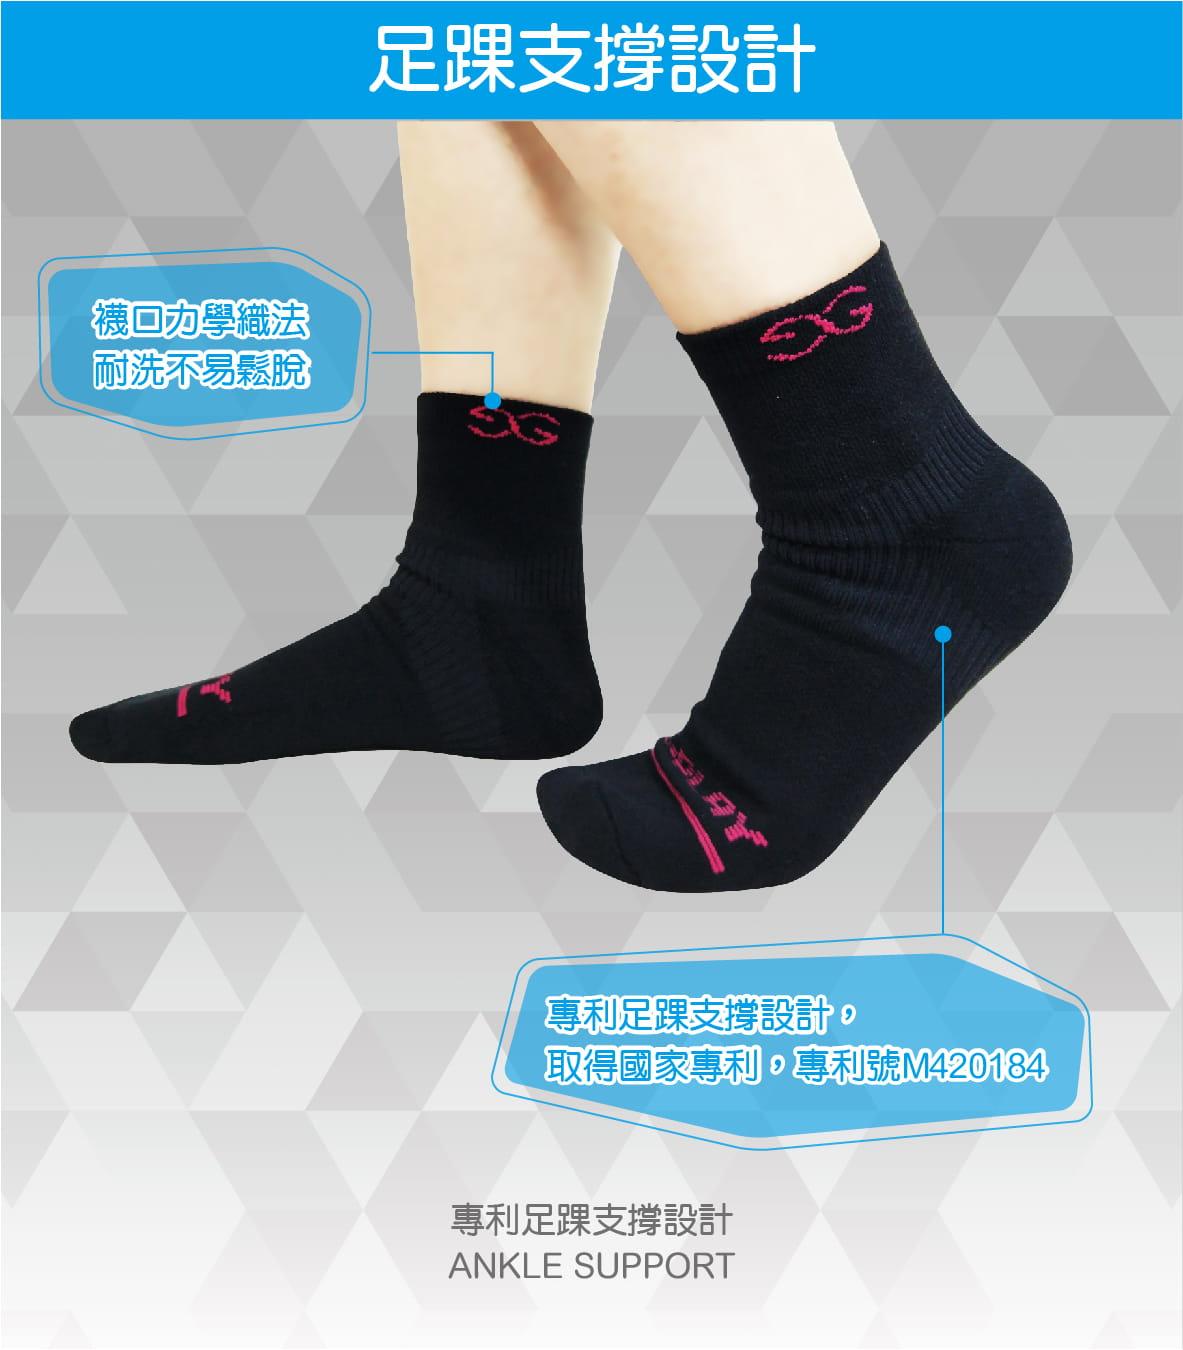 【EG-PLAY】SPORTS SOCKS 足踝支撐機能襪 3